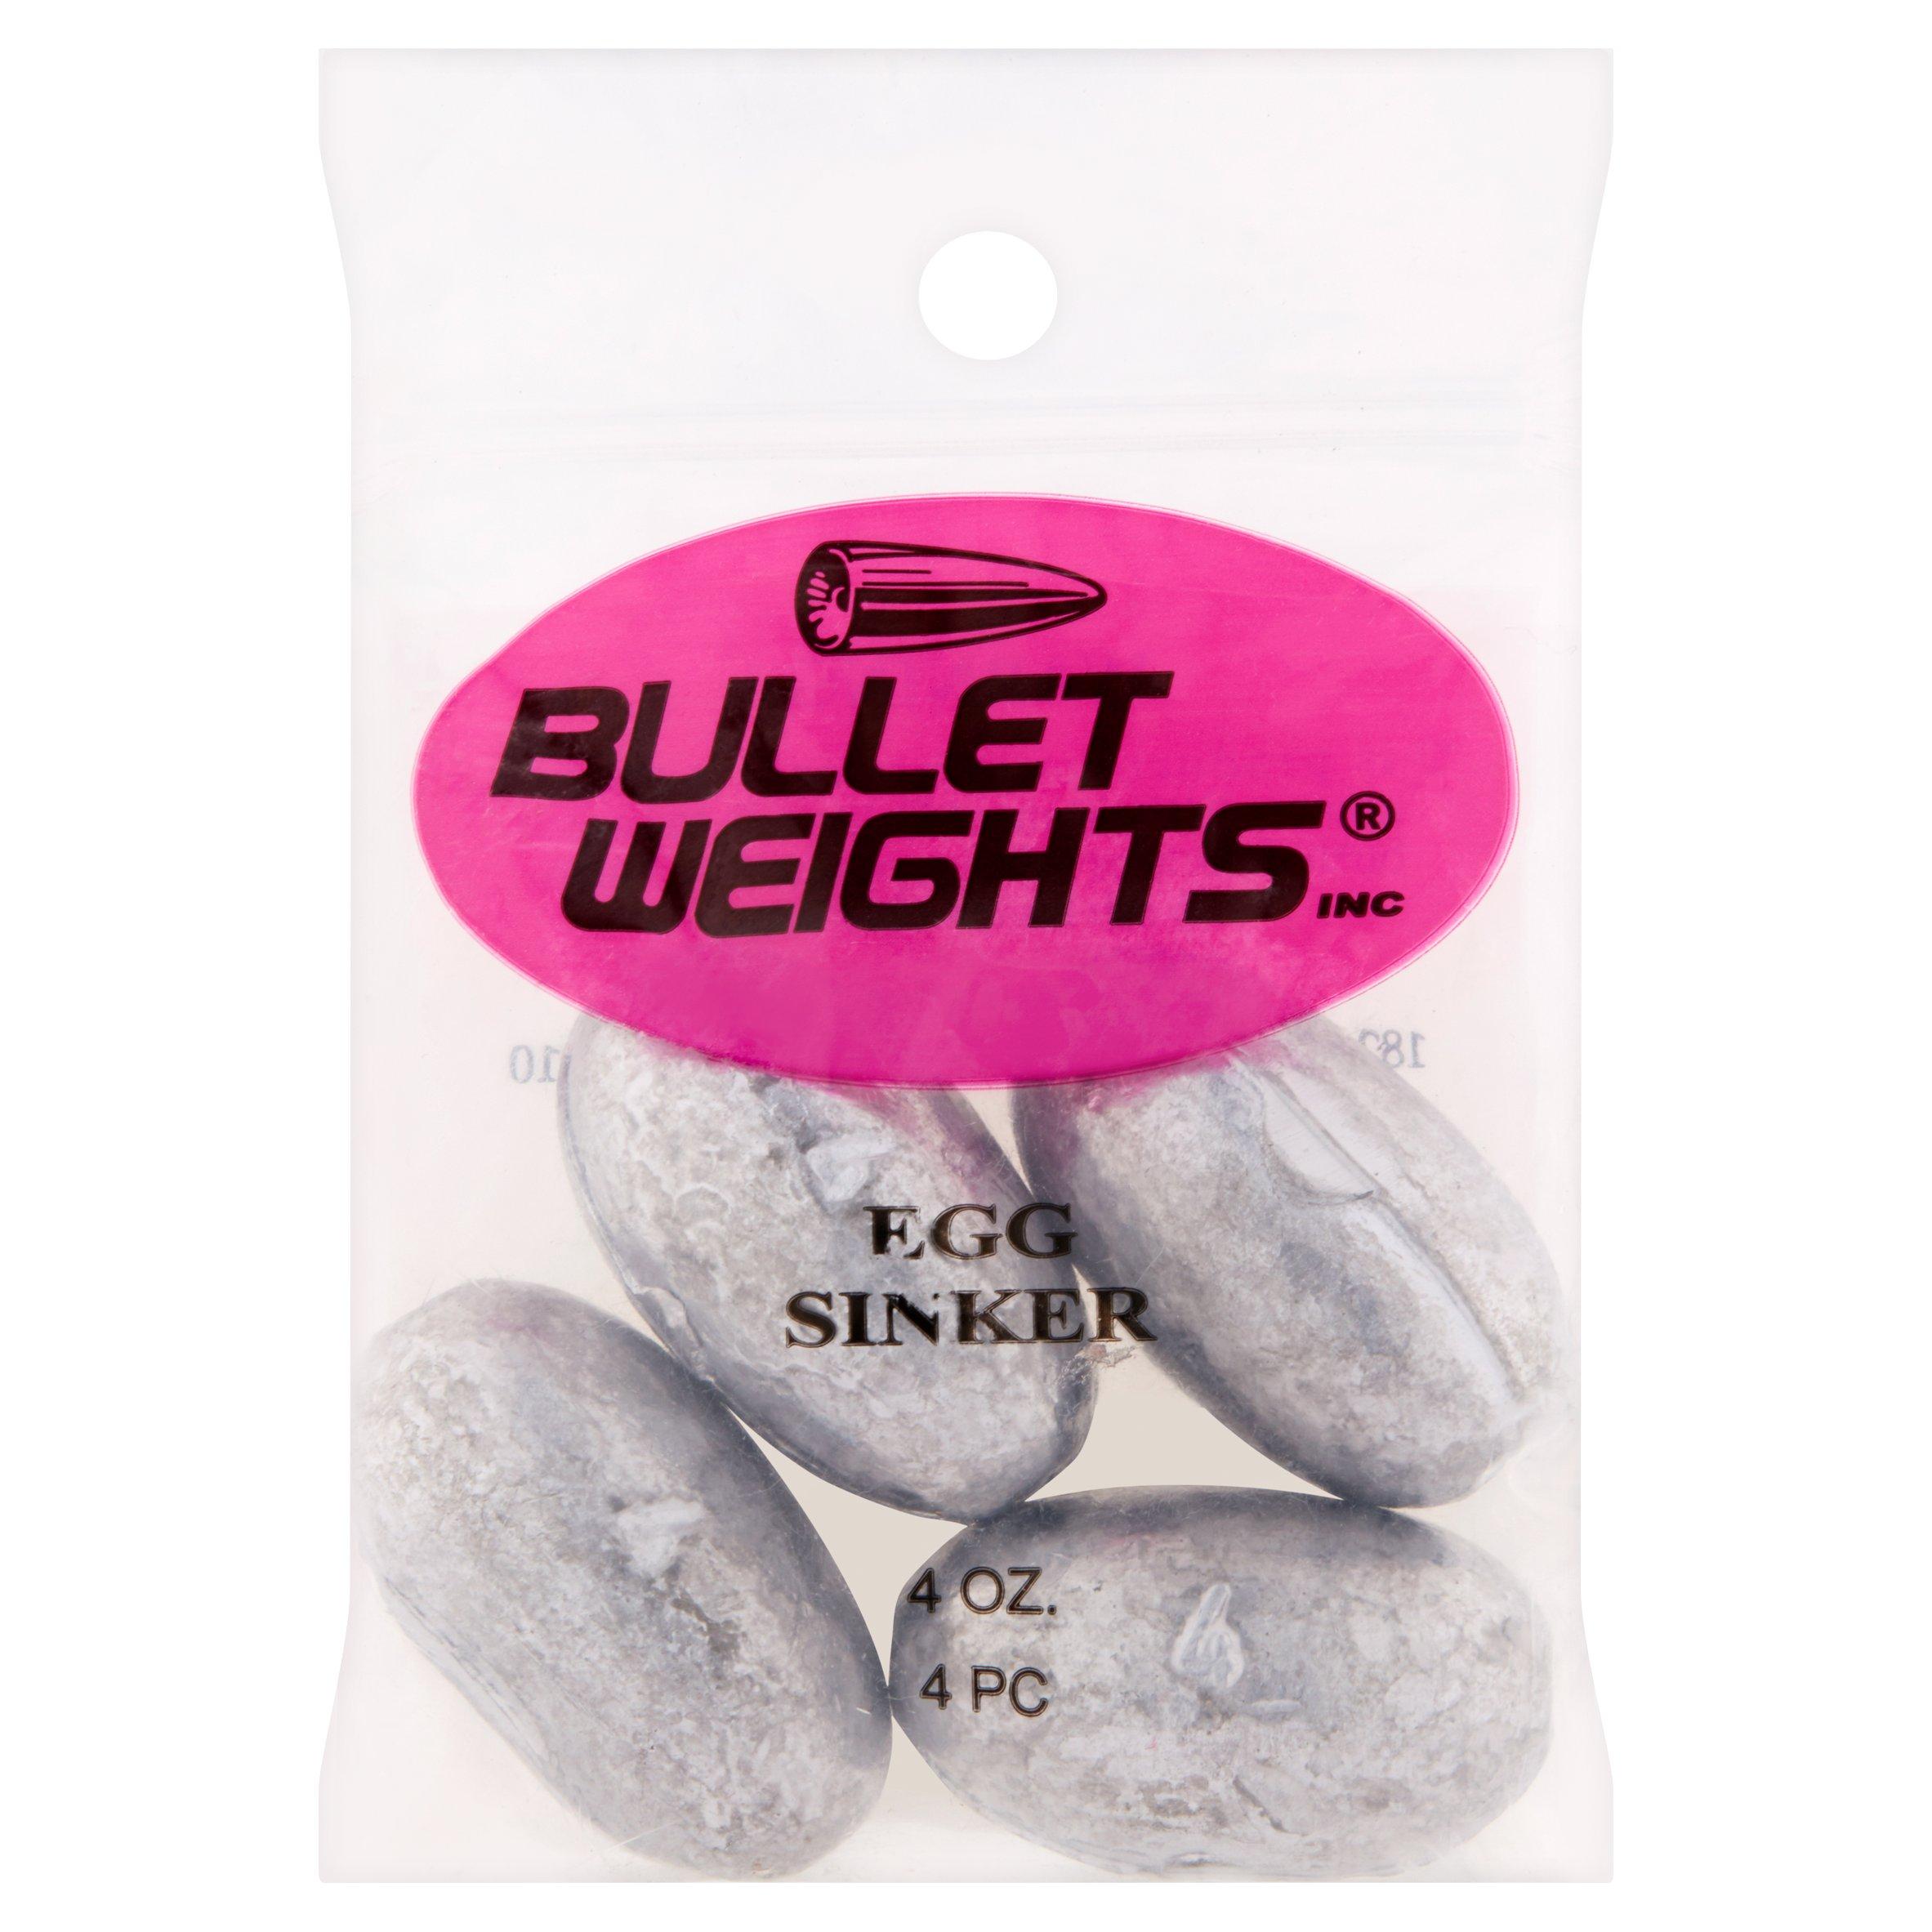 Bullet Weights® Egg Sinkers, 4 oz, 4 sinkers